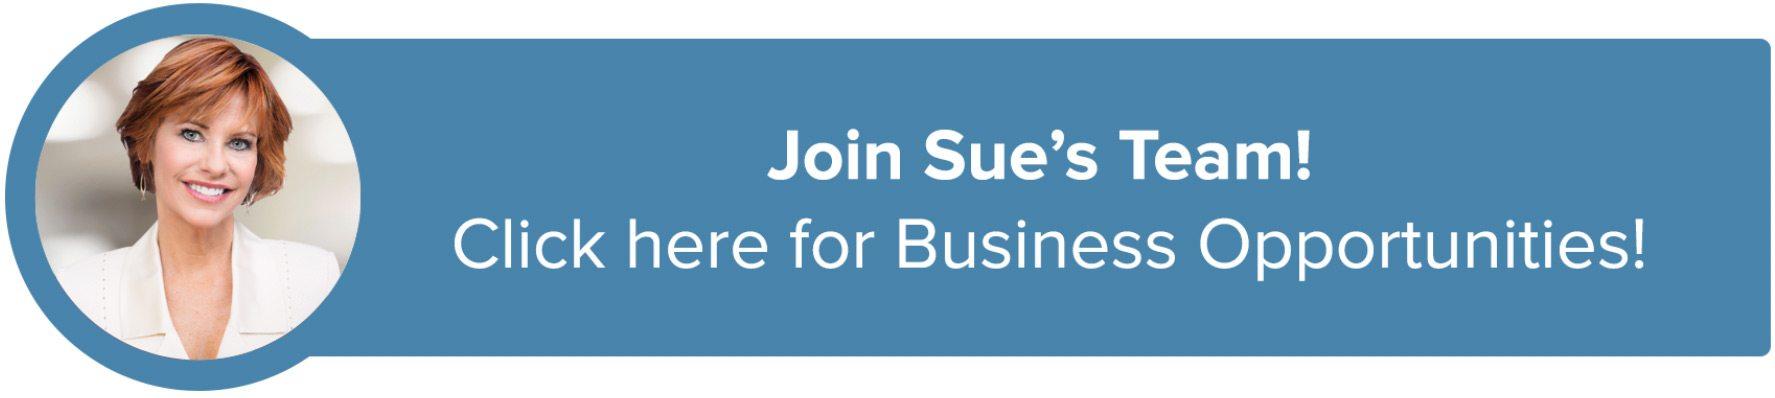 Sue Fries - Join Sue's Team!